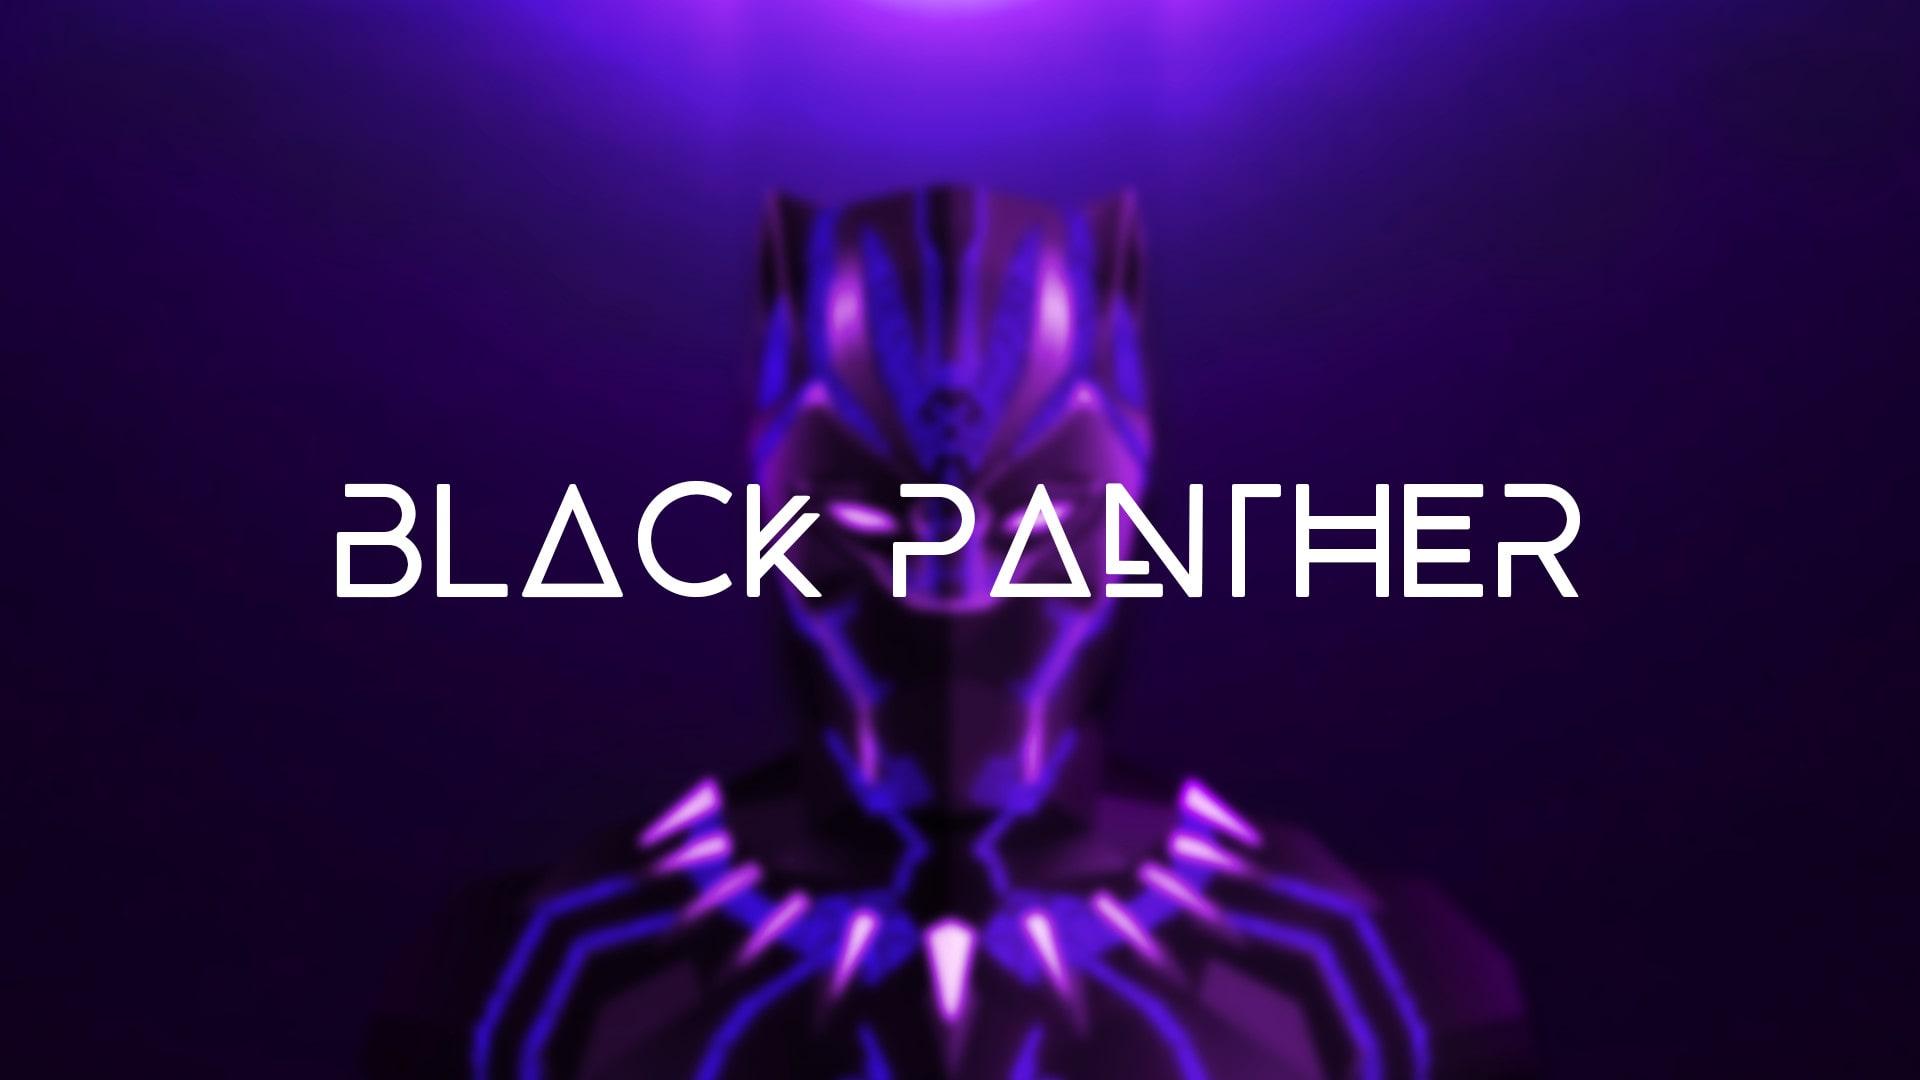 Create A Black Panther Text Logo By Vivekgawande